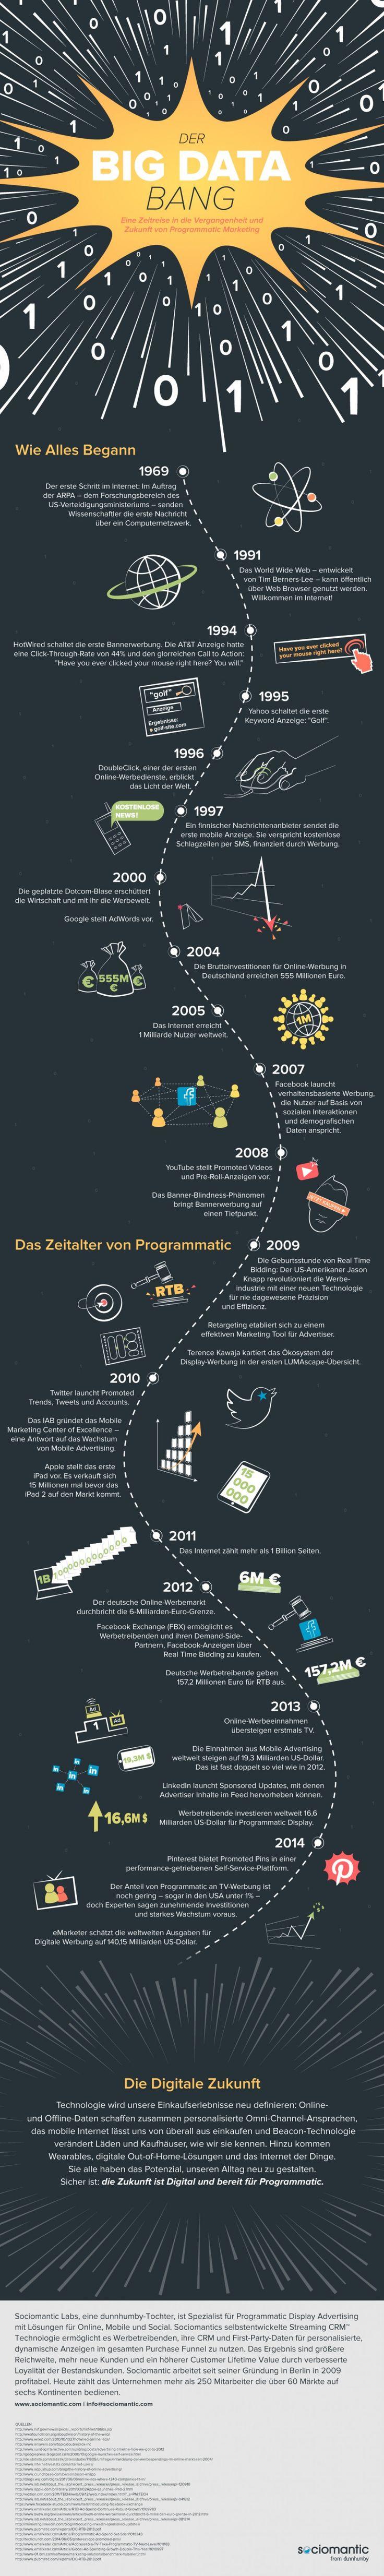 "Programmatic-Marketing: Vergangenheit, Gegenwart und Zukunft. (Grafik: <a href=""https://www.sociomantic.com/blog/2014/12/the-big-data-bang/"">Sociomantic</a>)"